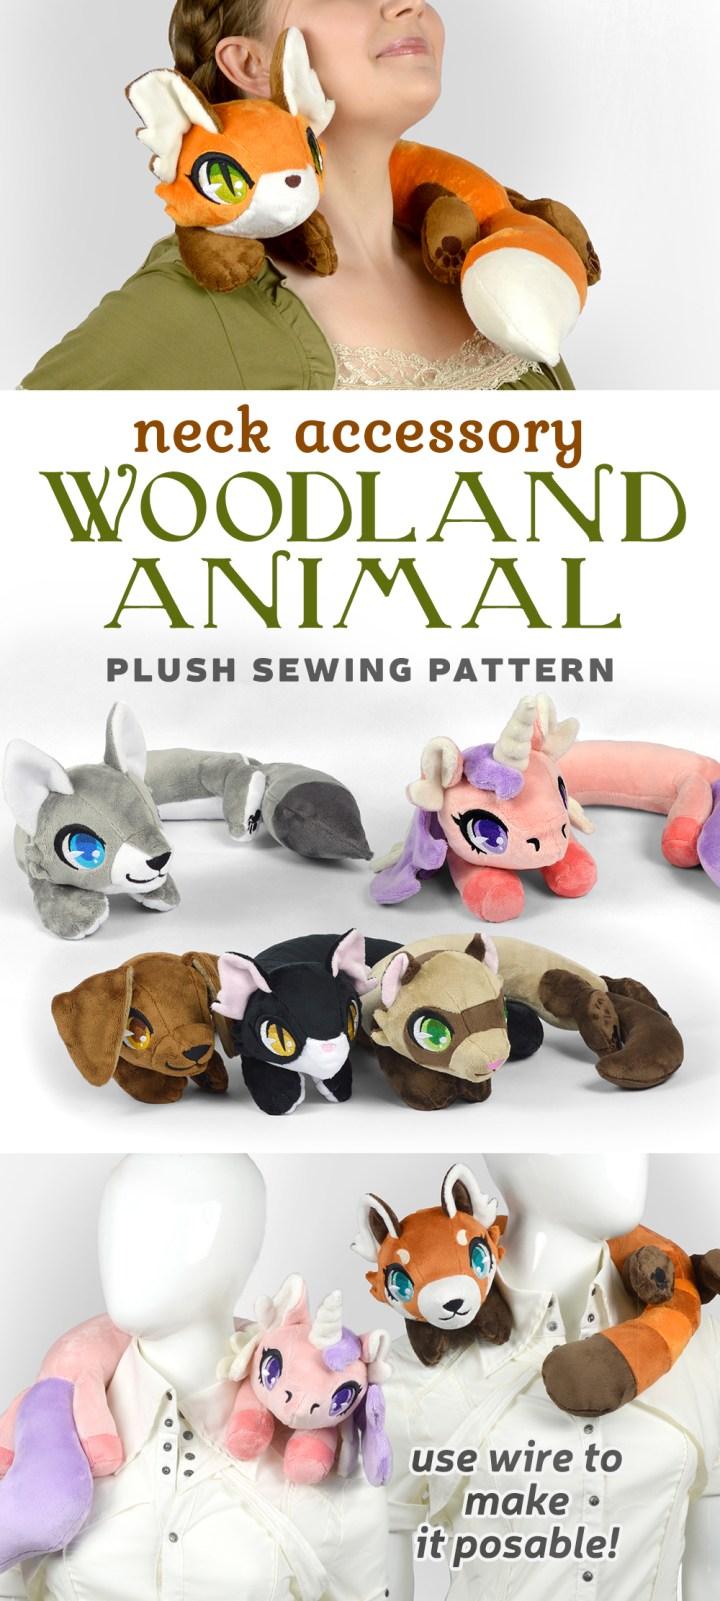 Woodland Animal Neck Plush Sewing Pattern